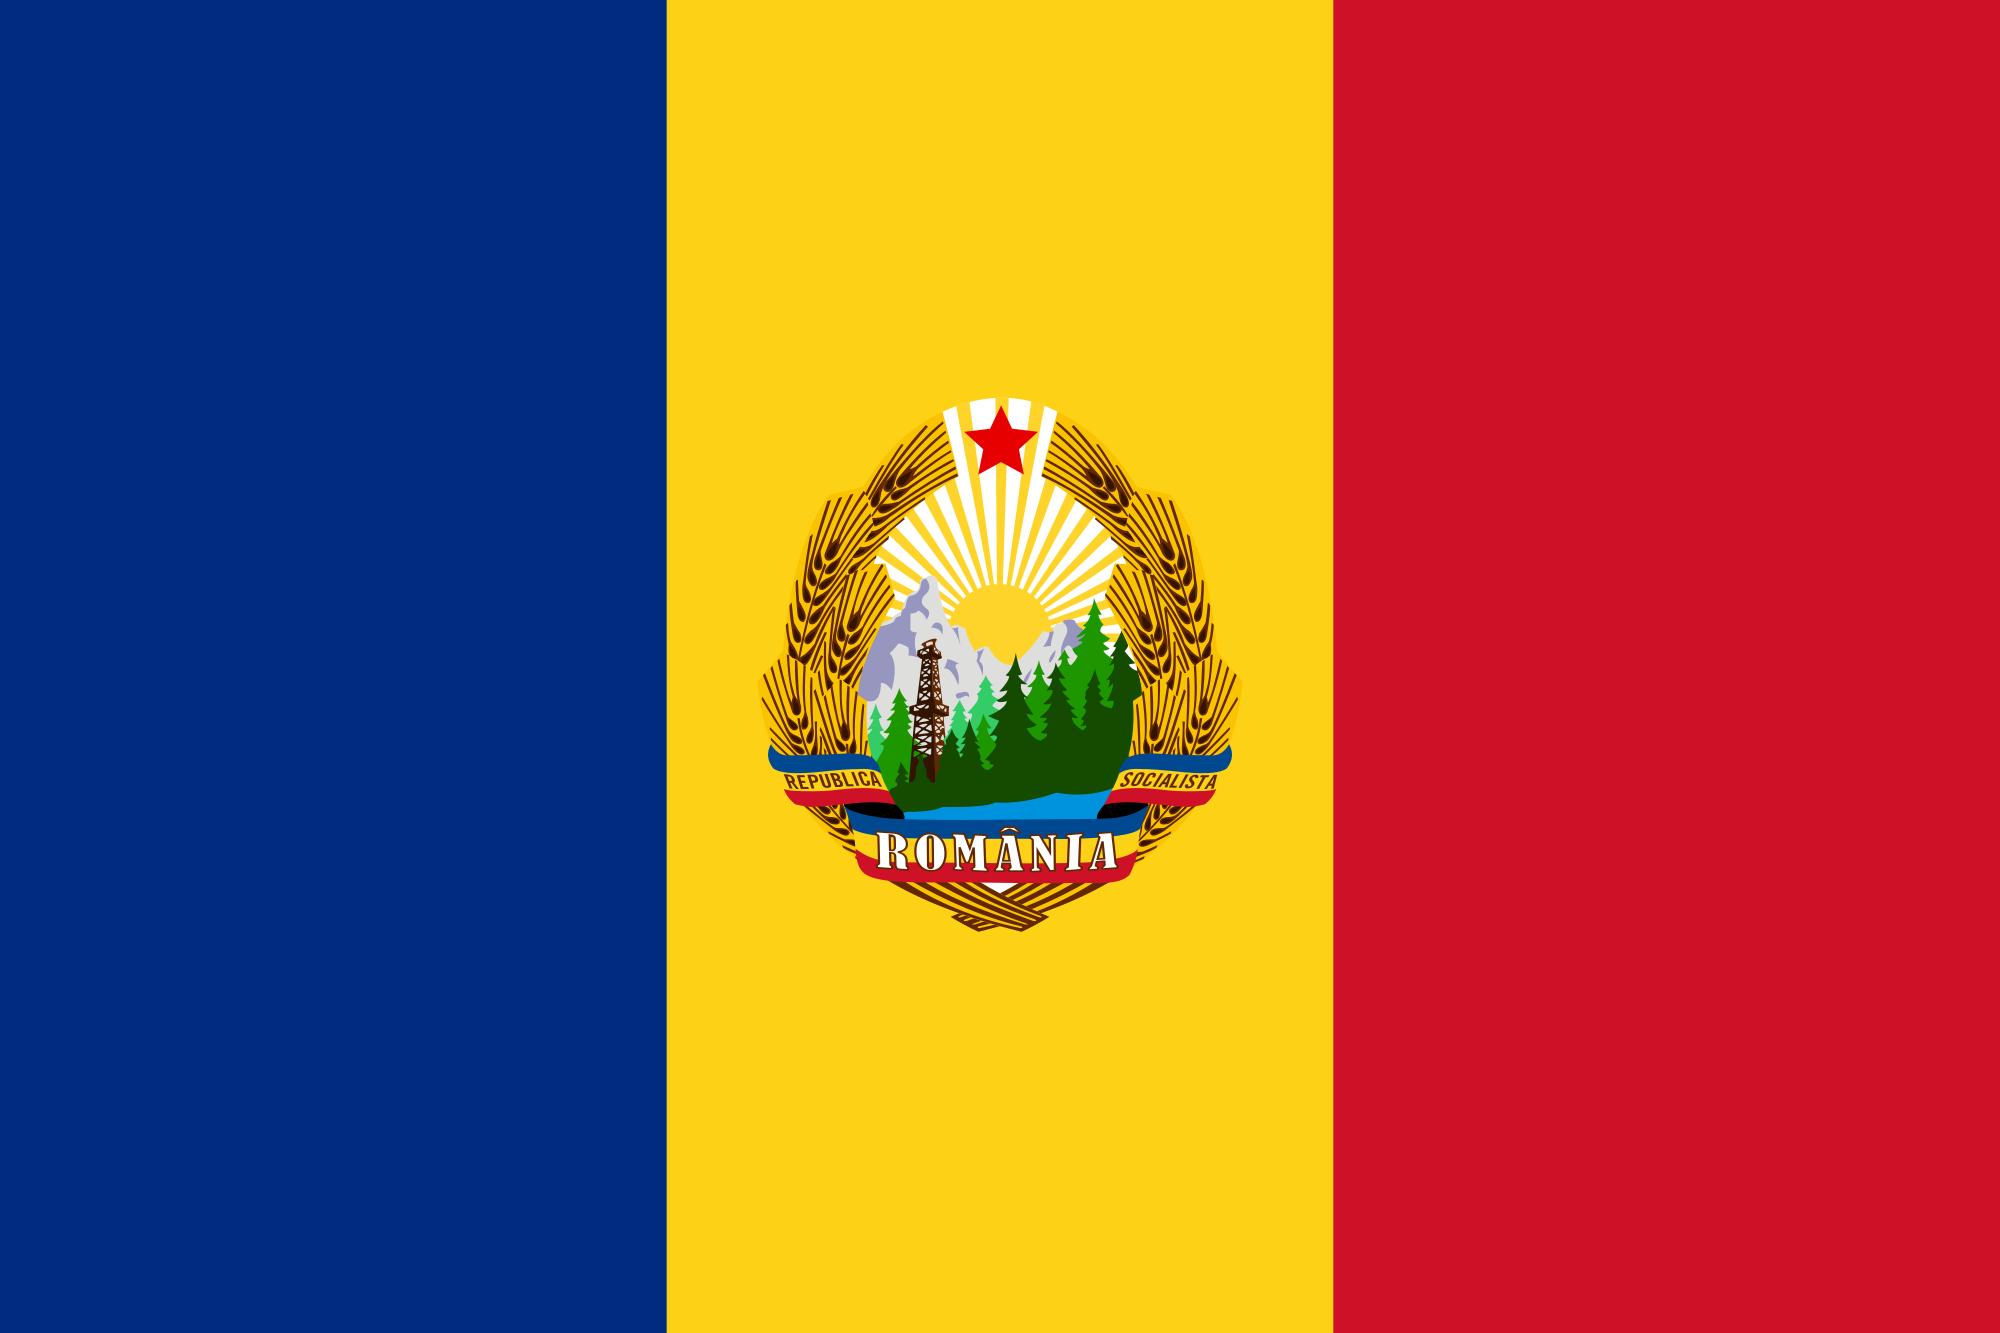 Romania's Iohannis wins presidential ballot, will face runoff